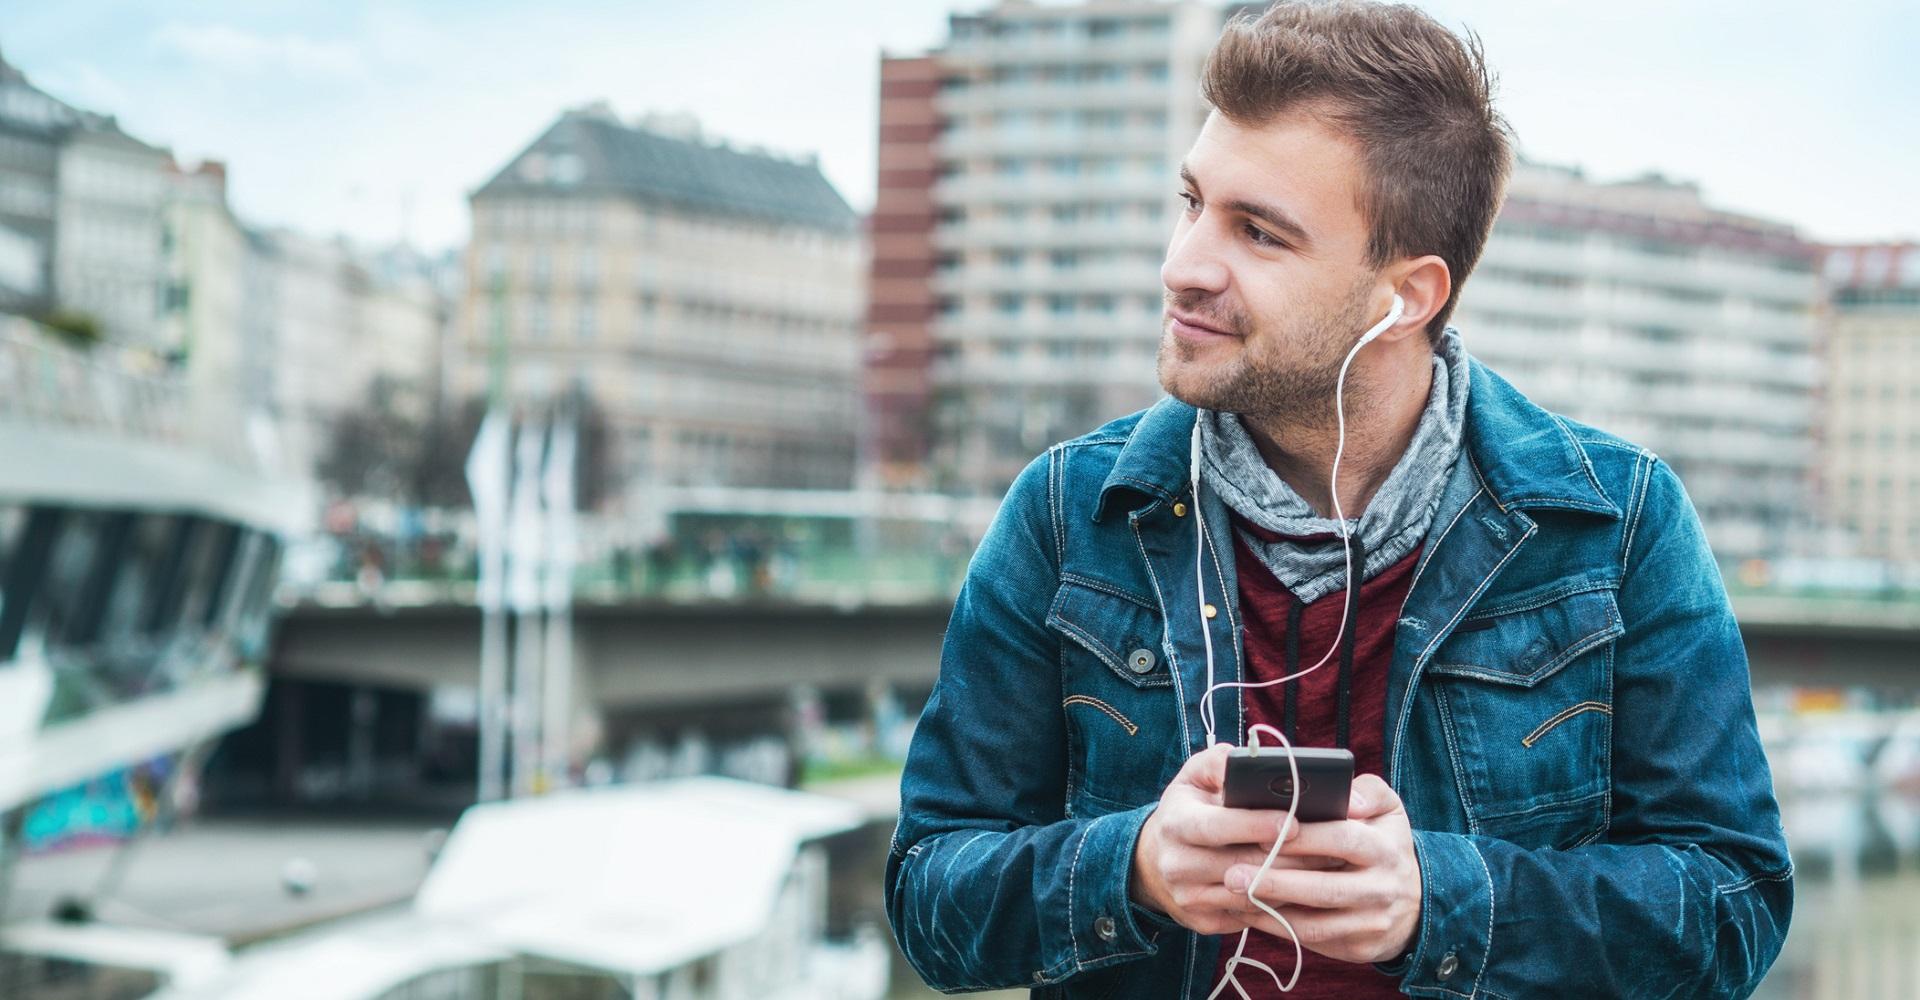 Junger Mann hört Musik über Spotify